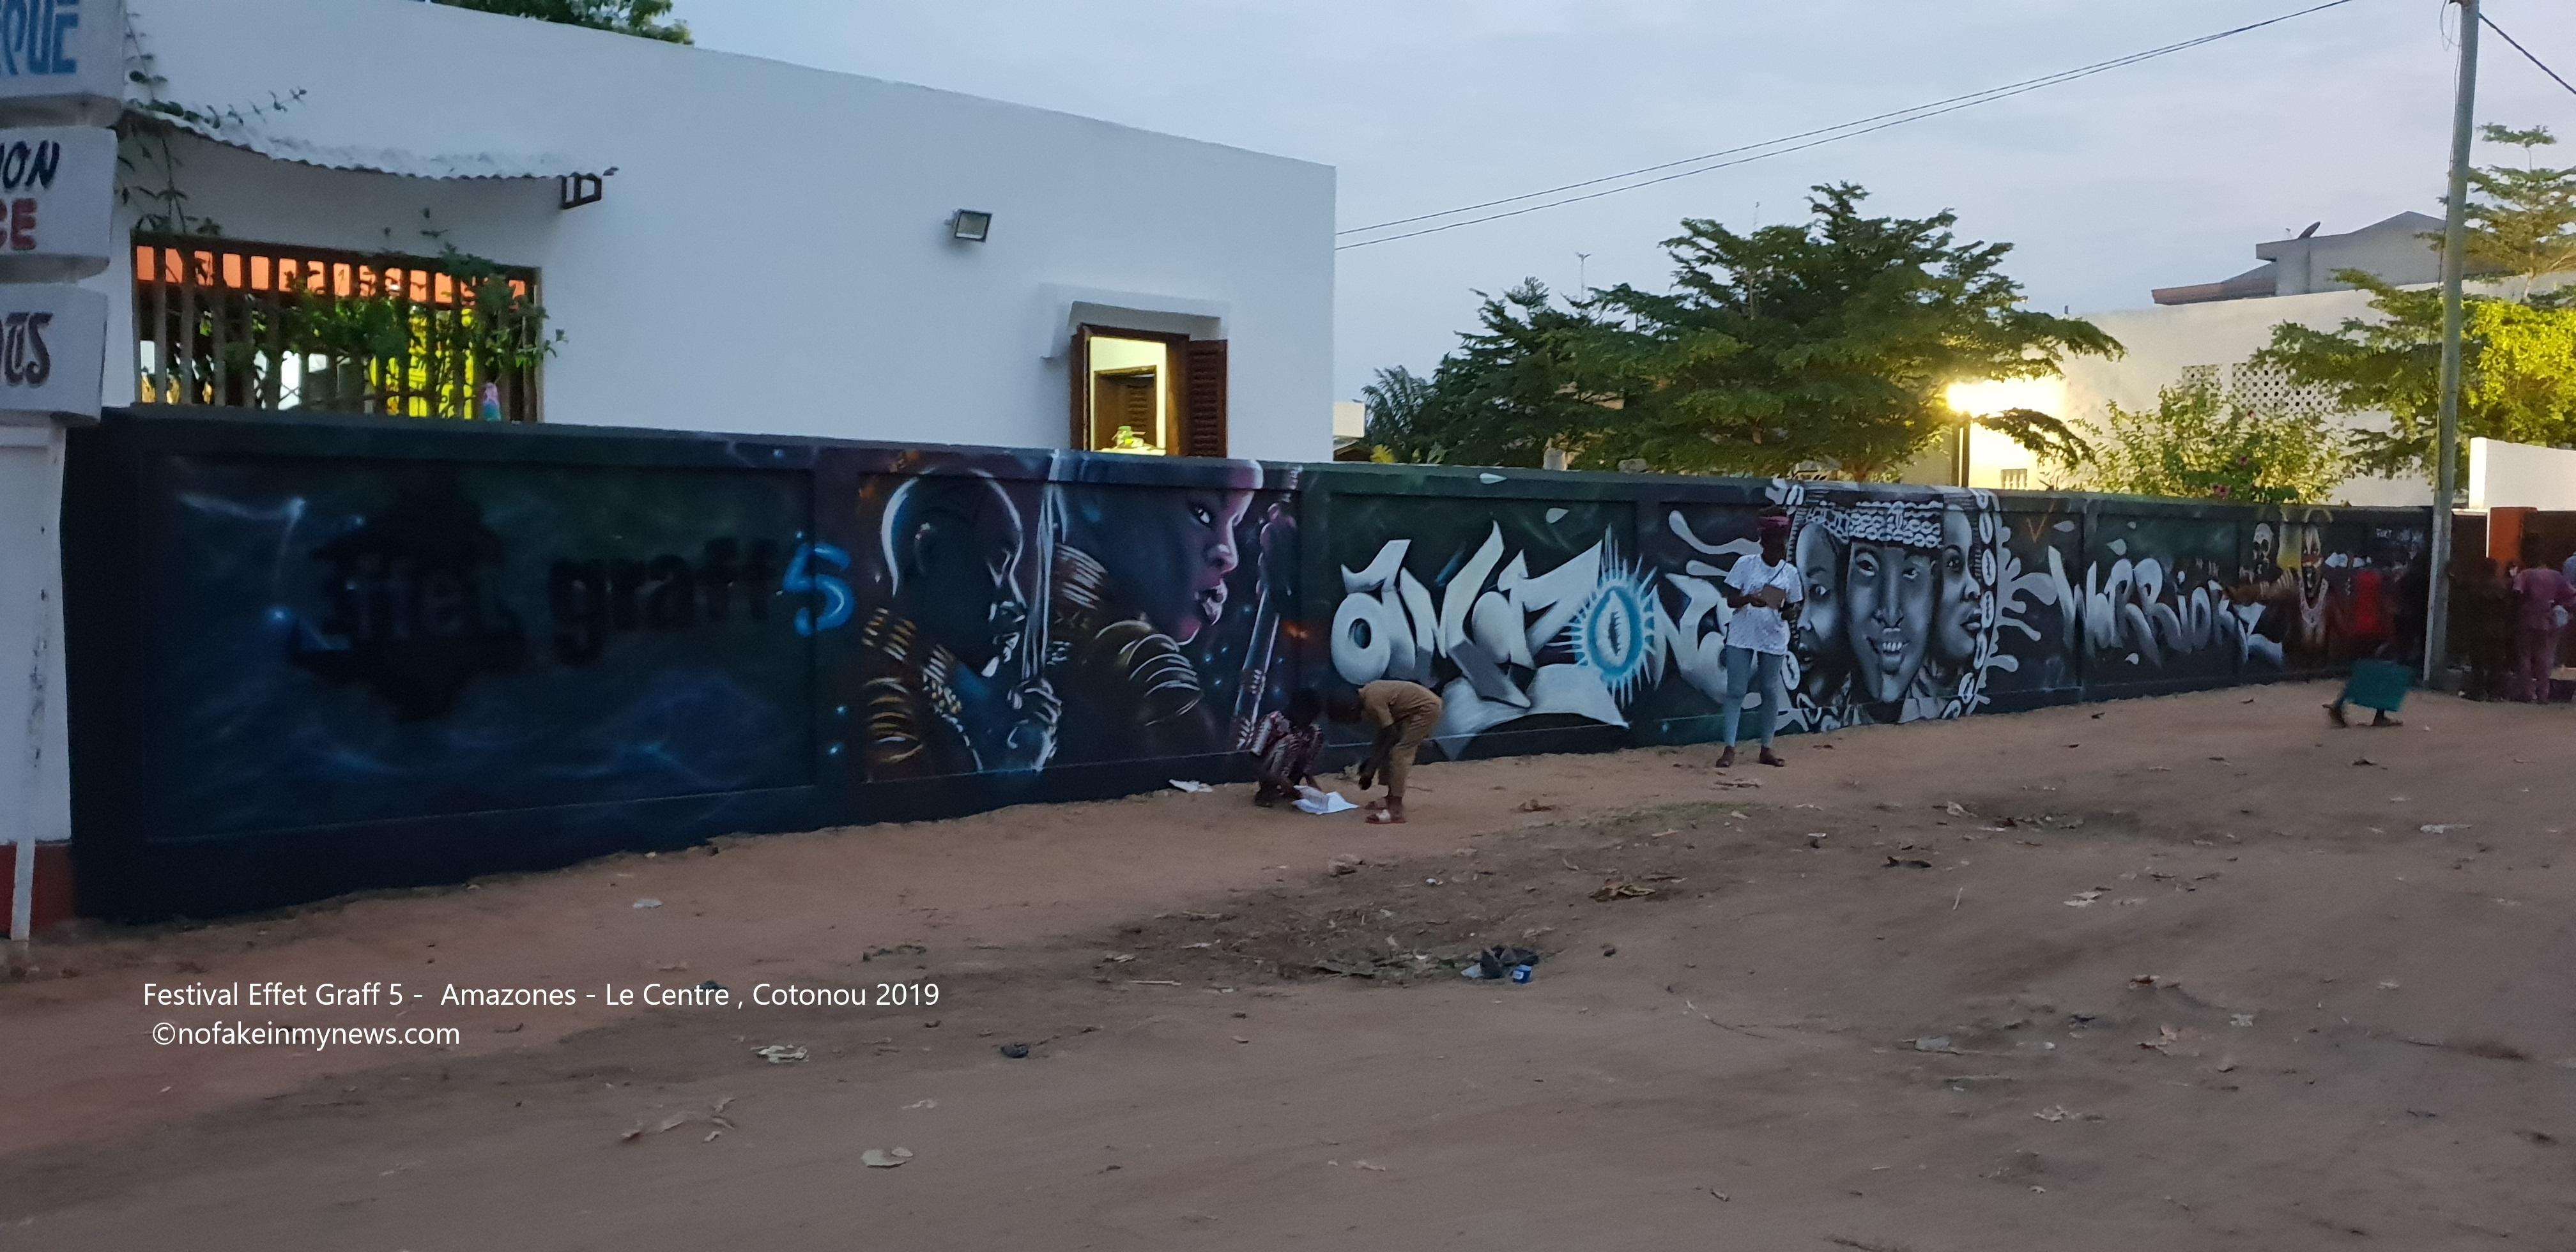 Festival Effet Graff 5 – Amazones – Le Centre Cotonou 2019 – ©nofakeinmynews